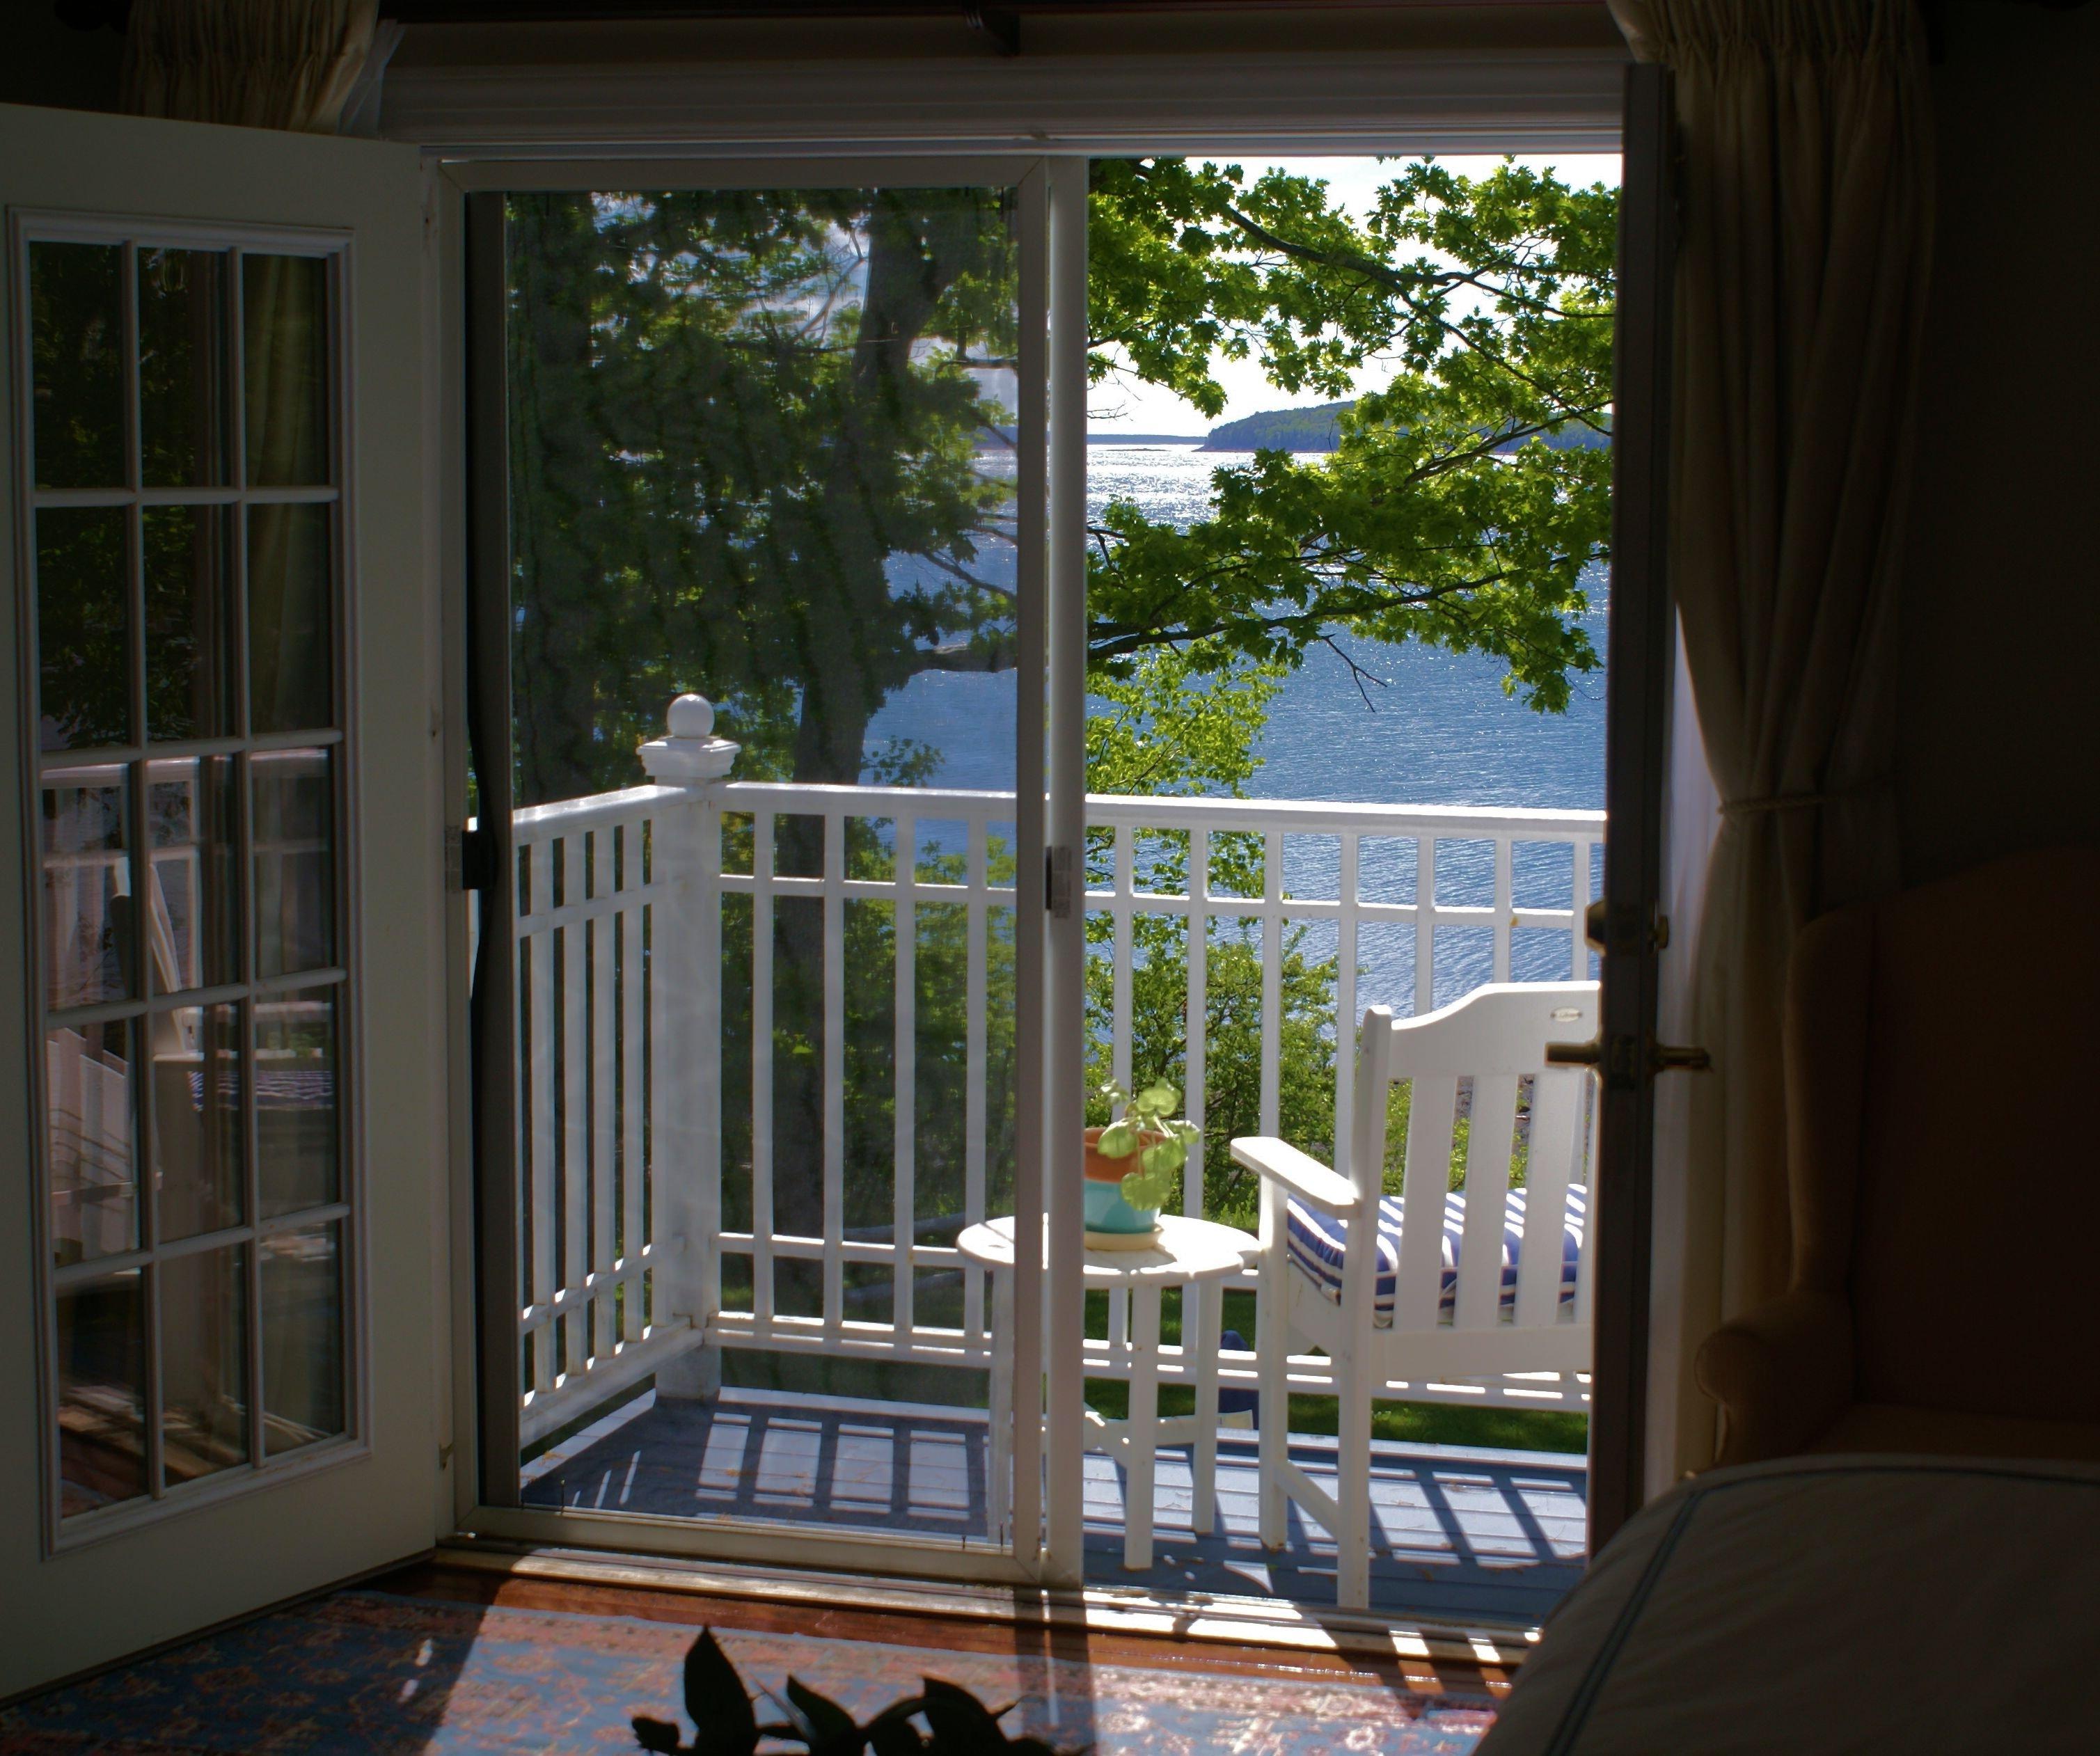 Mater Bedroom deck. Ocean view of North Atlantic.